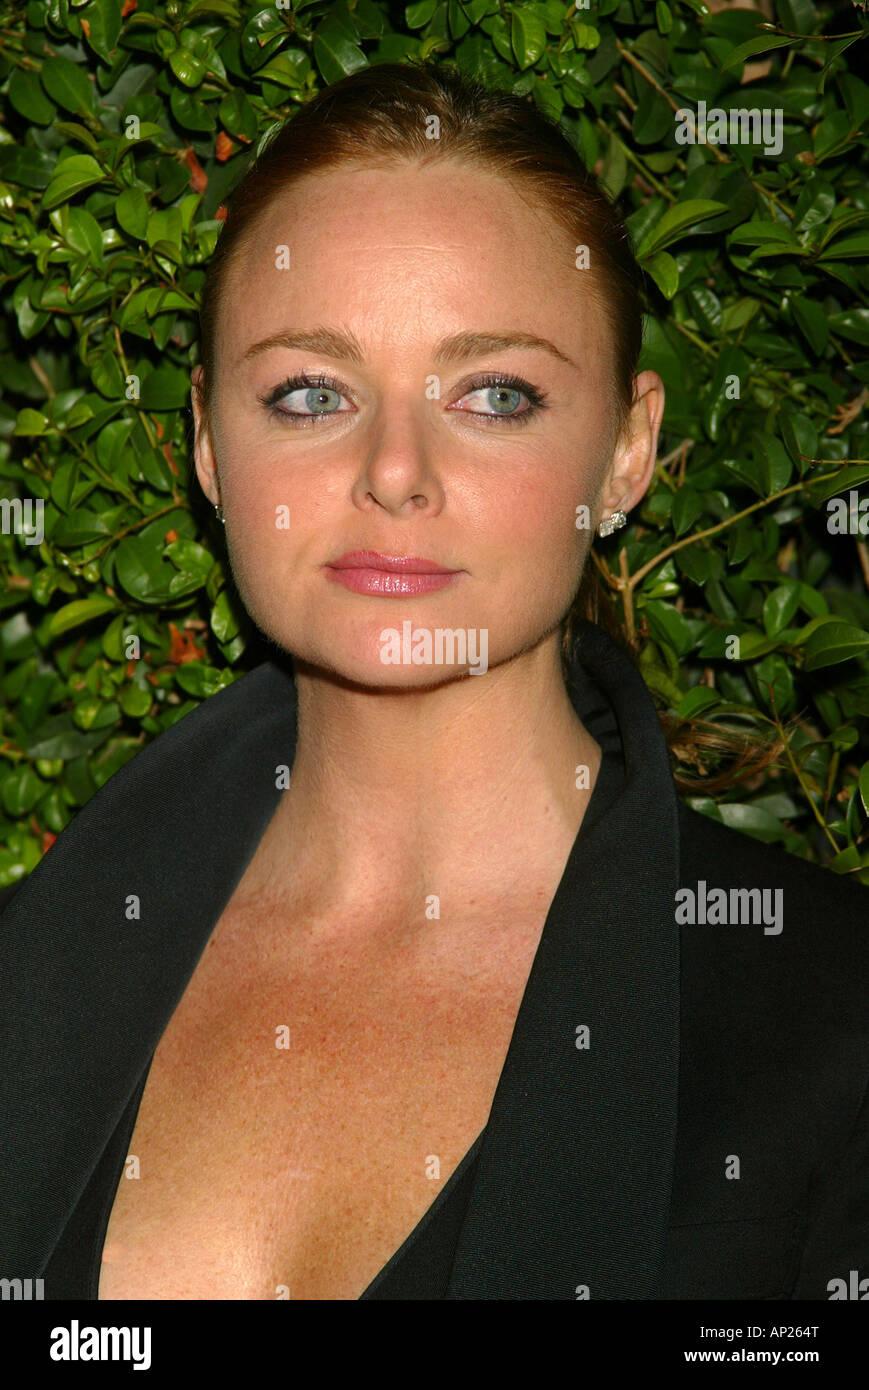 Stella Mccartney Fashion Designer Daughter Of Paul Mccartney In 2007 Stock Photo Alamy